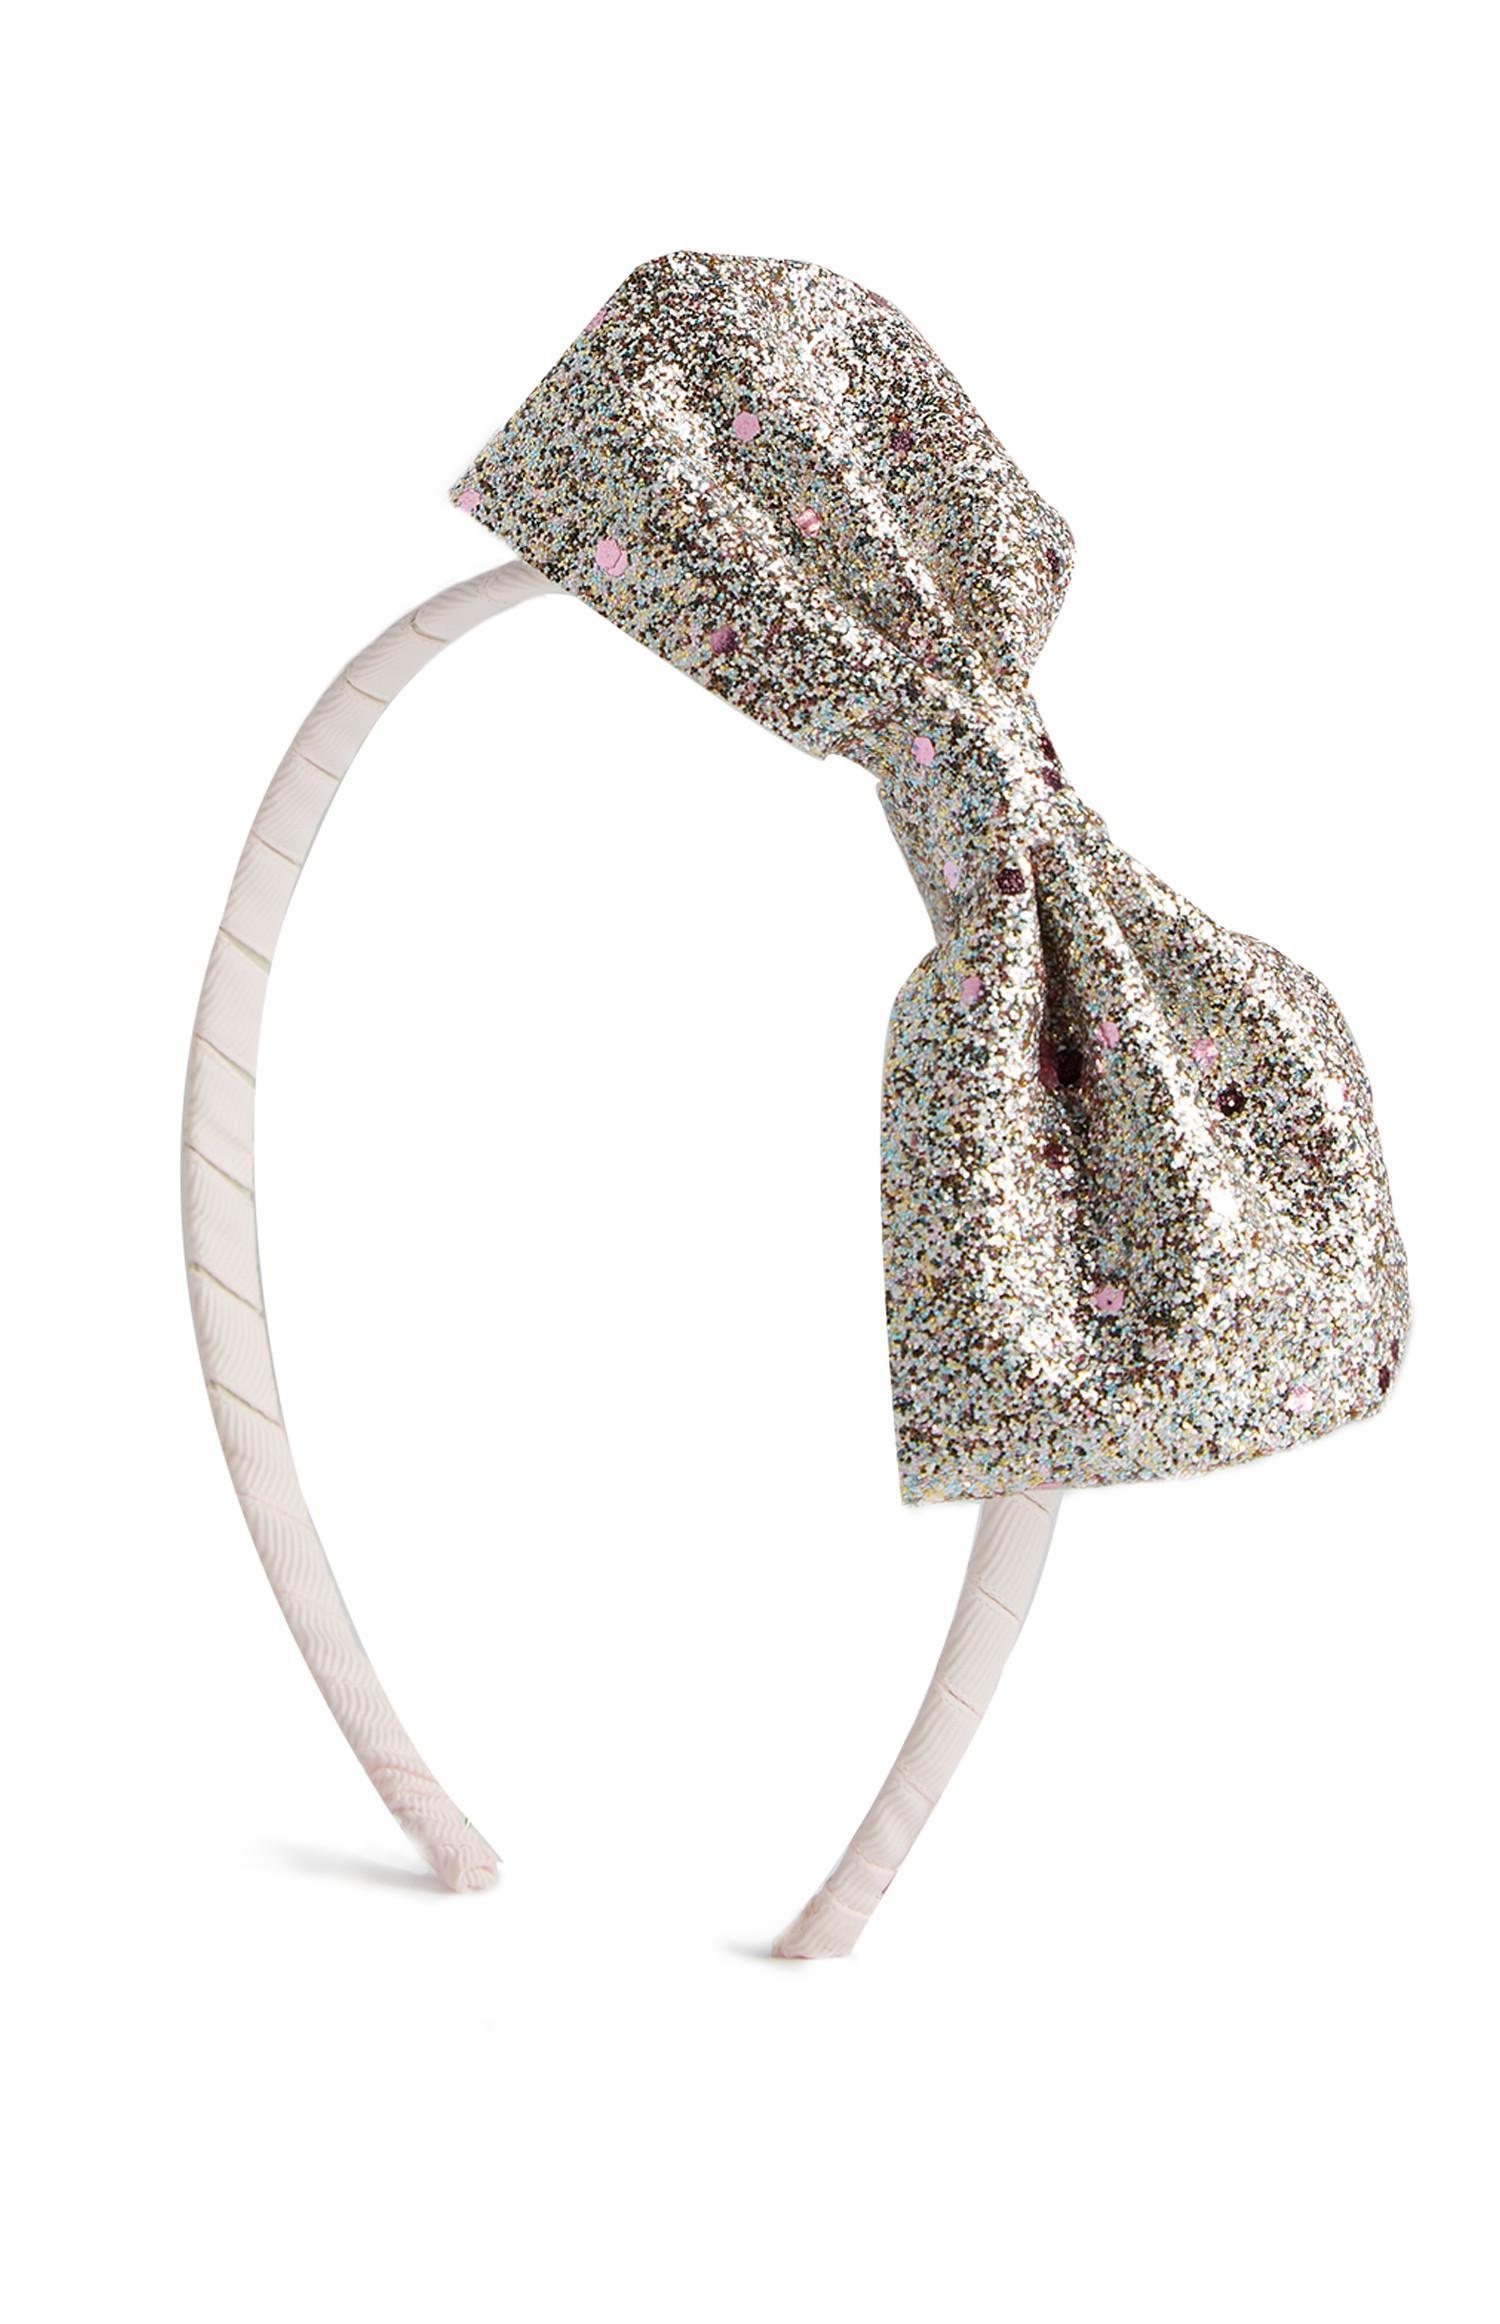 Chunky Glitter Bow Hairband